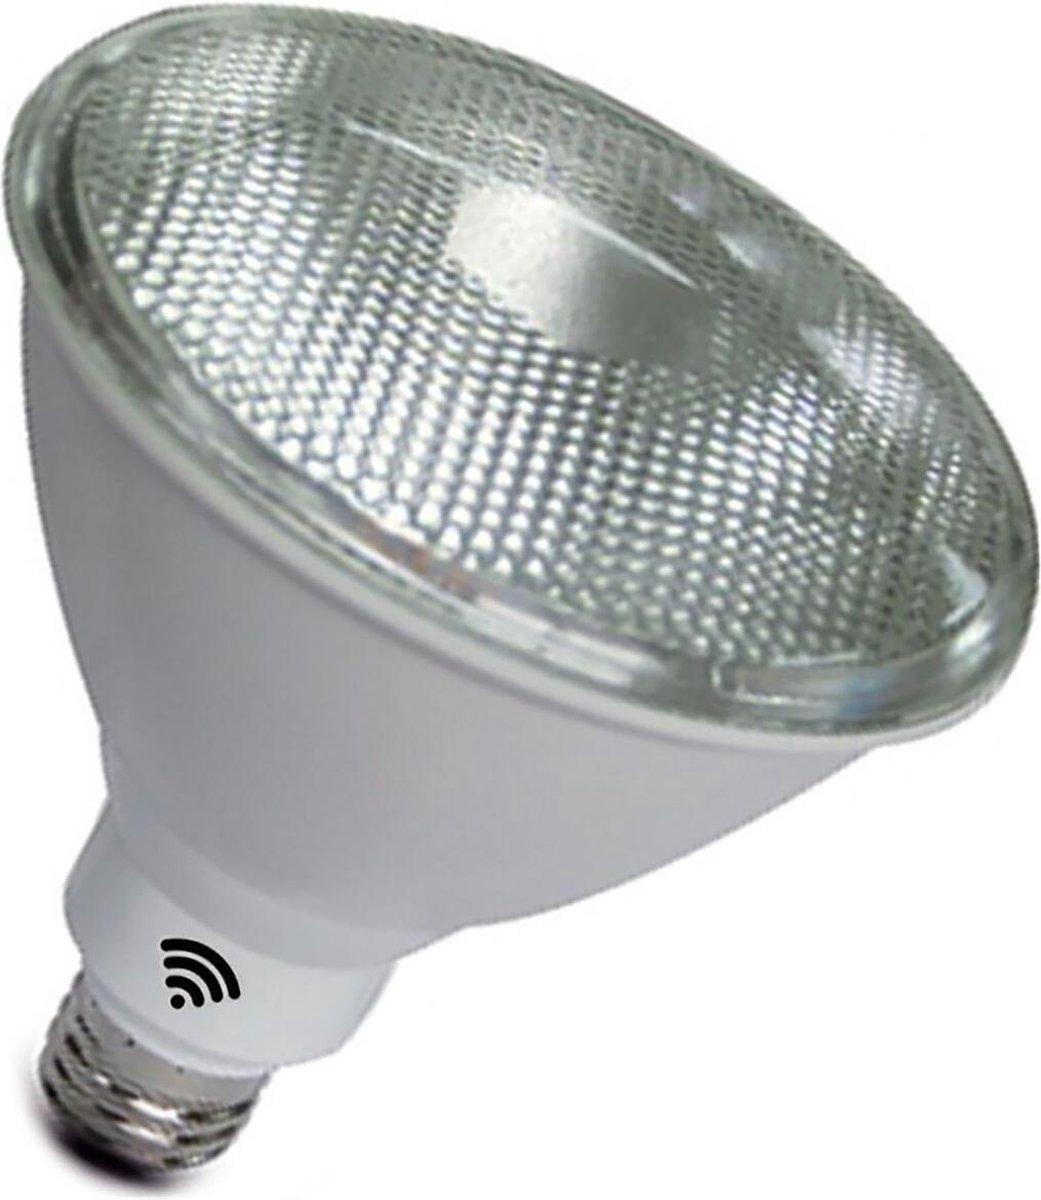 LED Lamp - Smart LED - Frikto Sponty - PAR Lamp - 12W - E27 Fitting - Slimme LED - Wifi LED - Dimbaar - Aanpasbare Kleur - RGB+CCT - Waterdicht